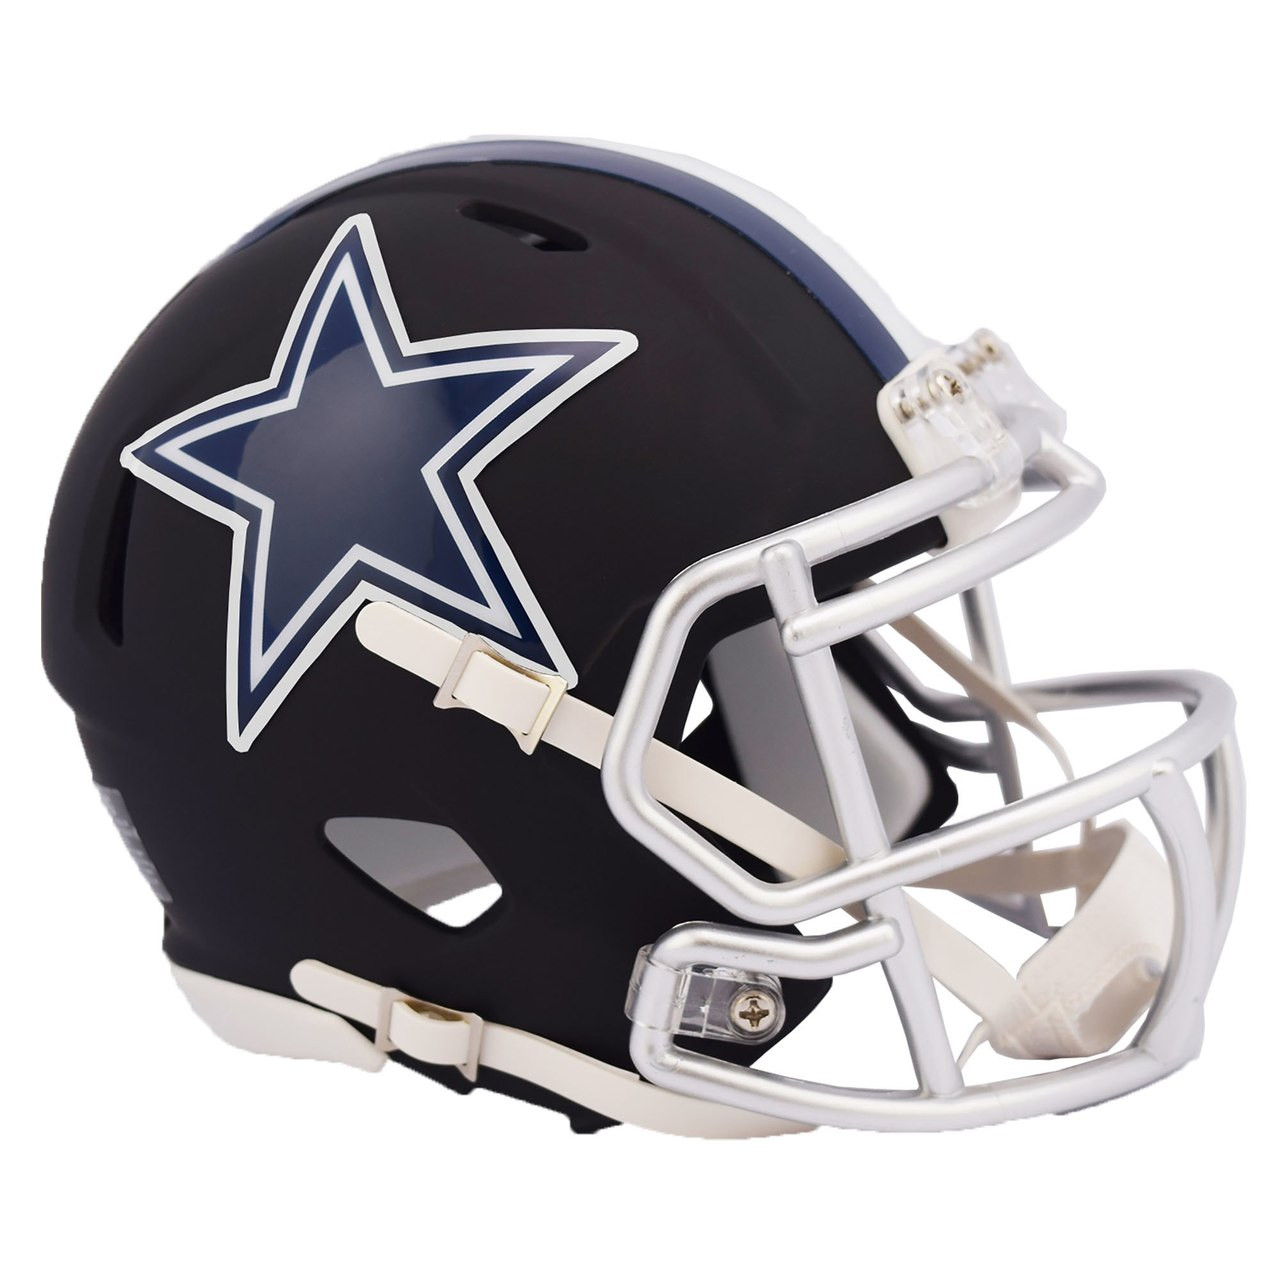 8da7d7d75 Riddell Dallas Cowboys Black Matte Alternate Speed Mini Football Helmet.  Riddell. Image 1